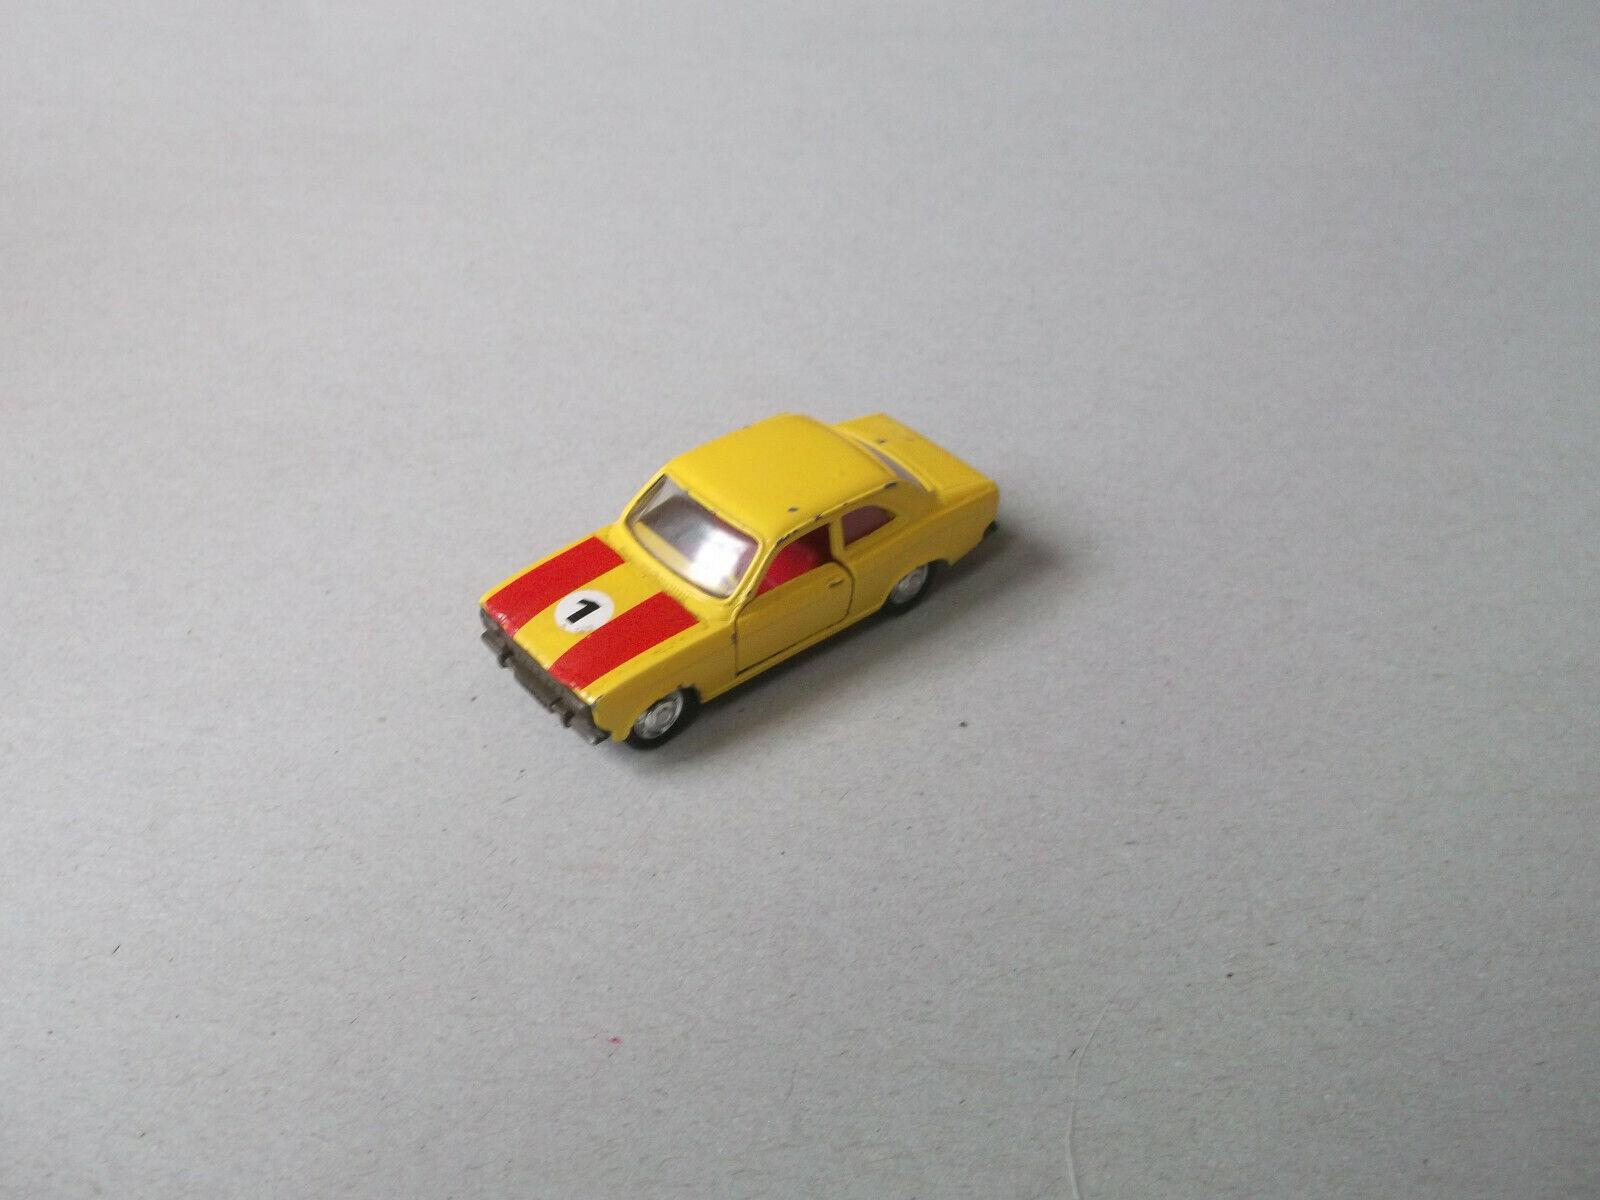 Schuco 1:66 Ford Escort (Tipo 1) Rally, NR 301851, 2 strisce rossa, RARO!!!